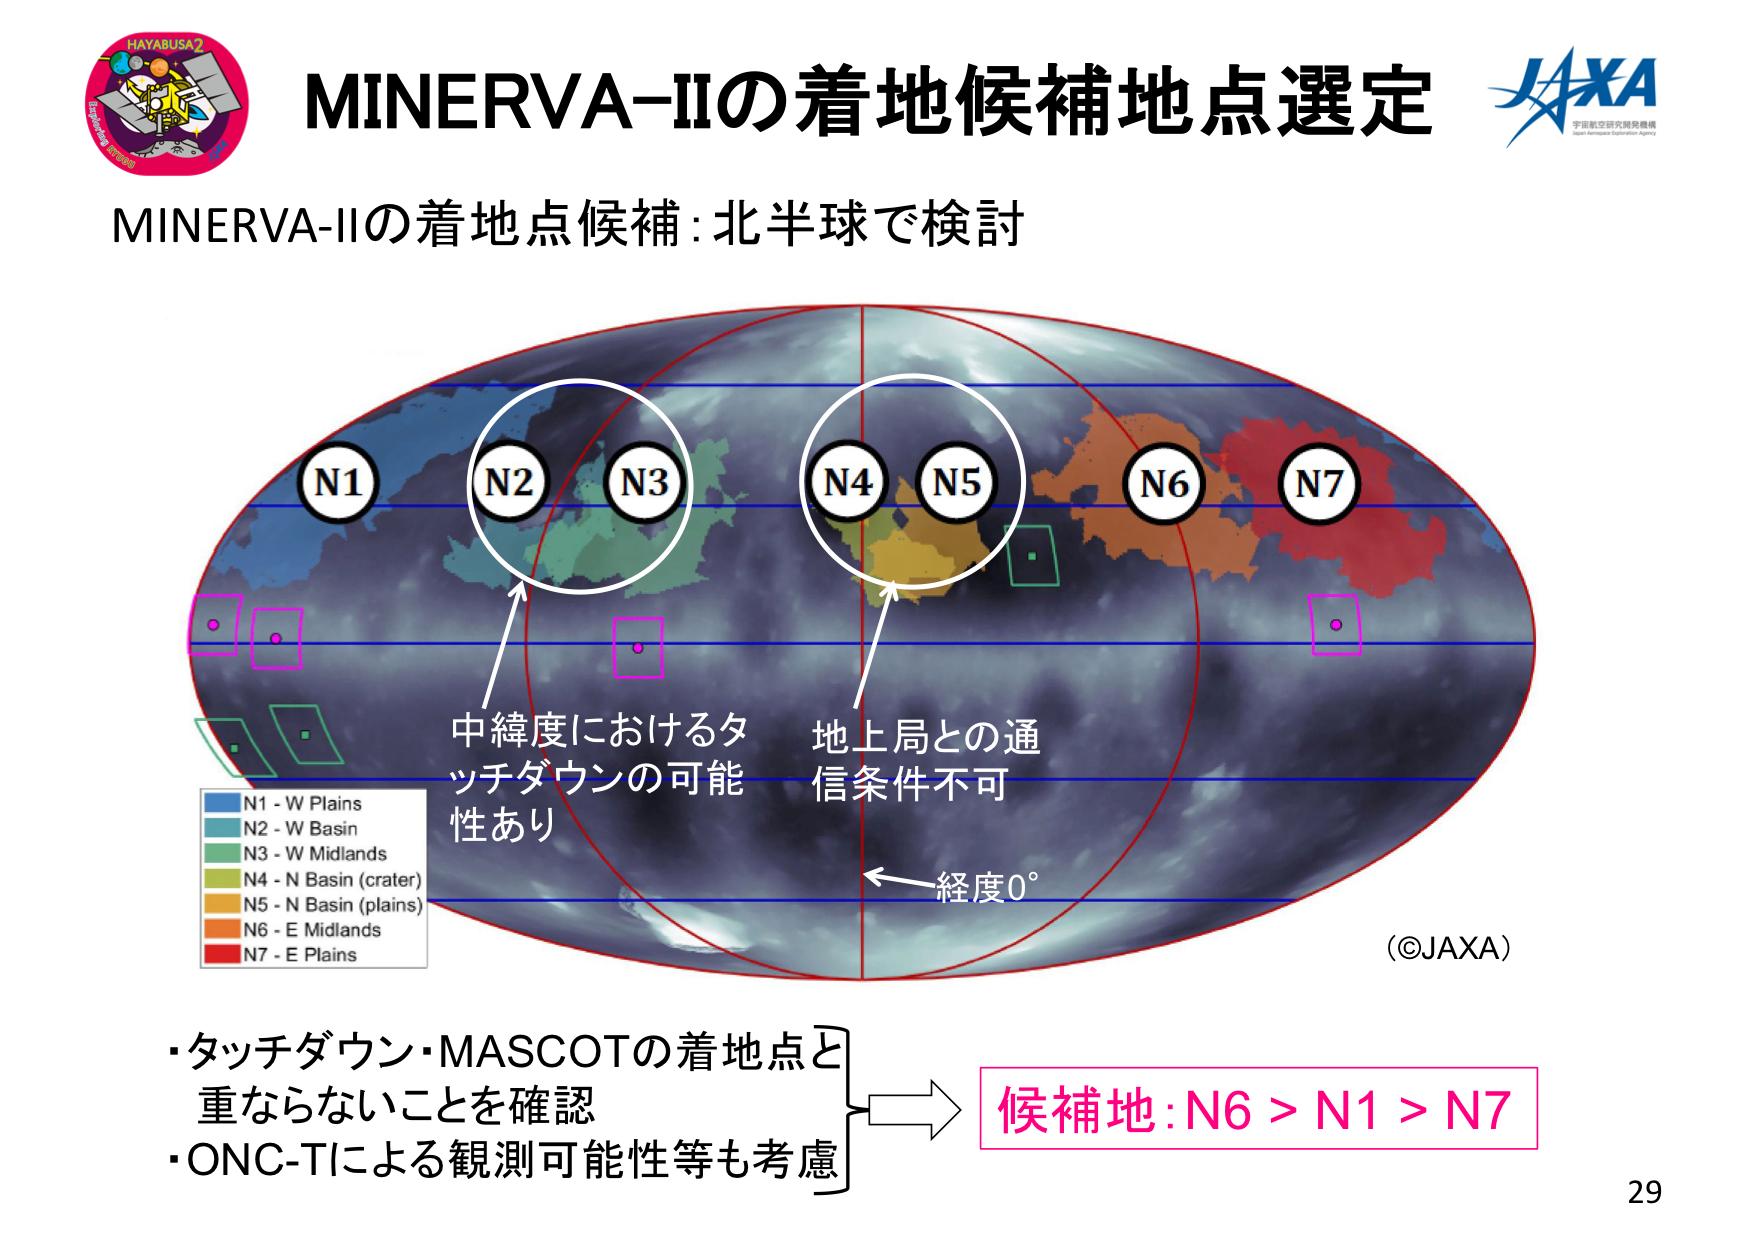 f:id:Imamura:20180905232001p:plain